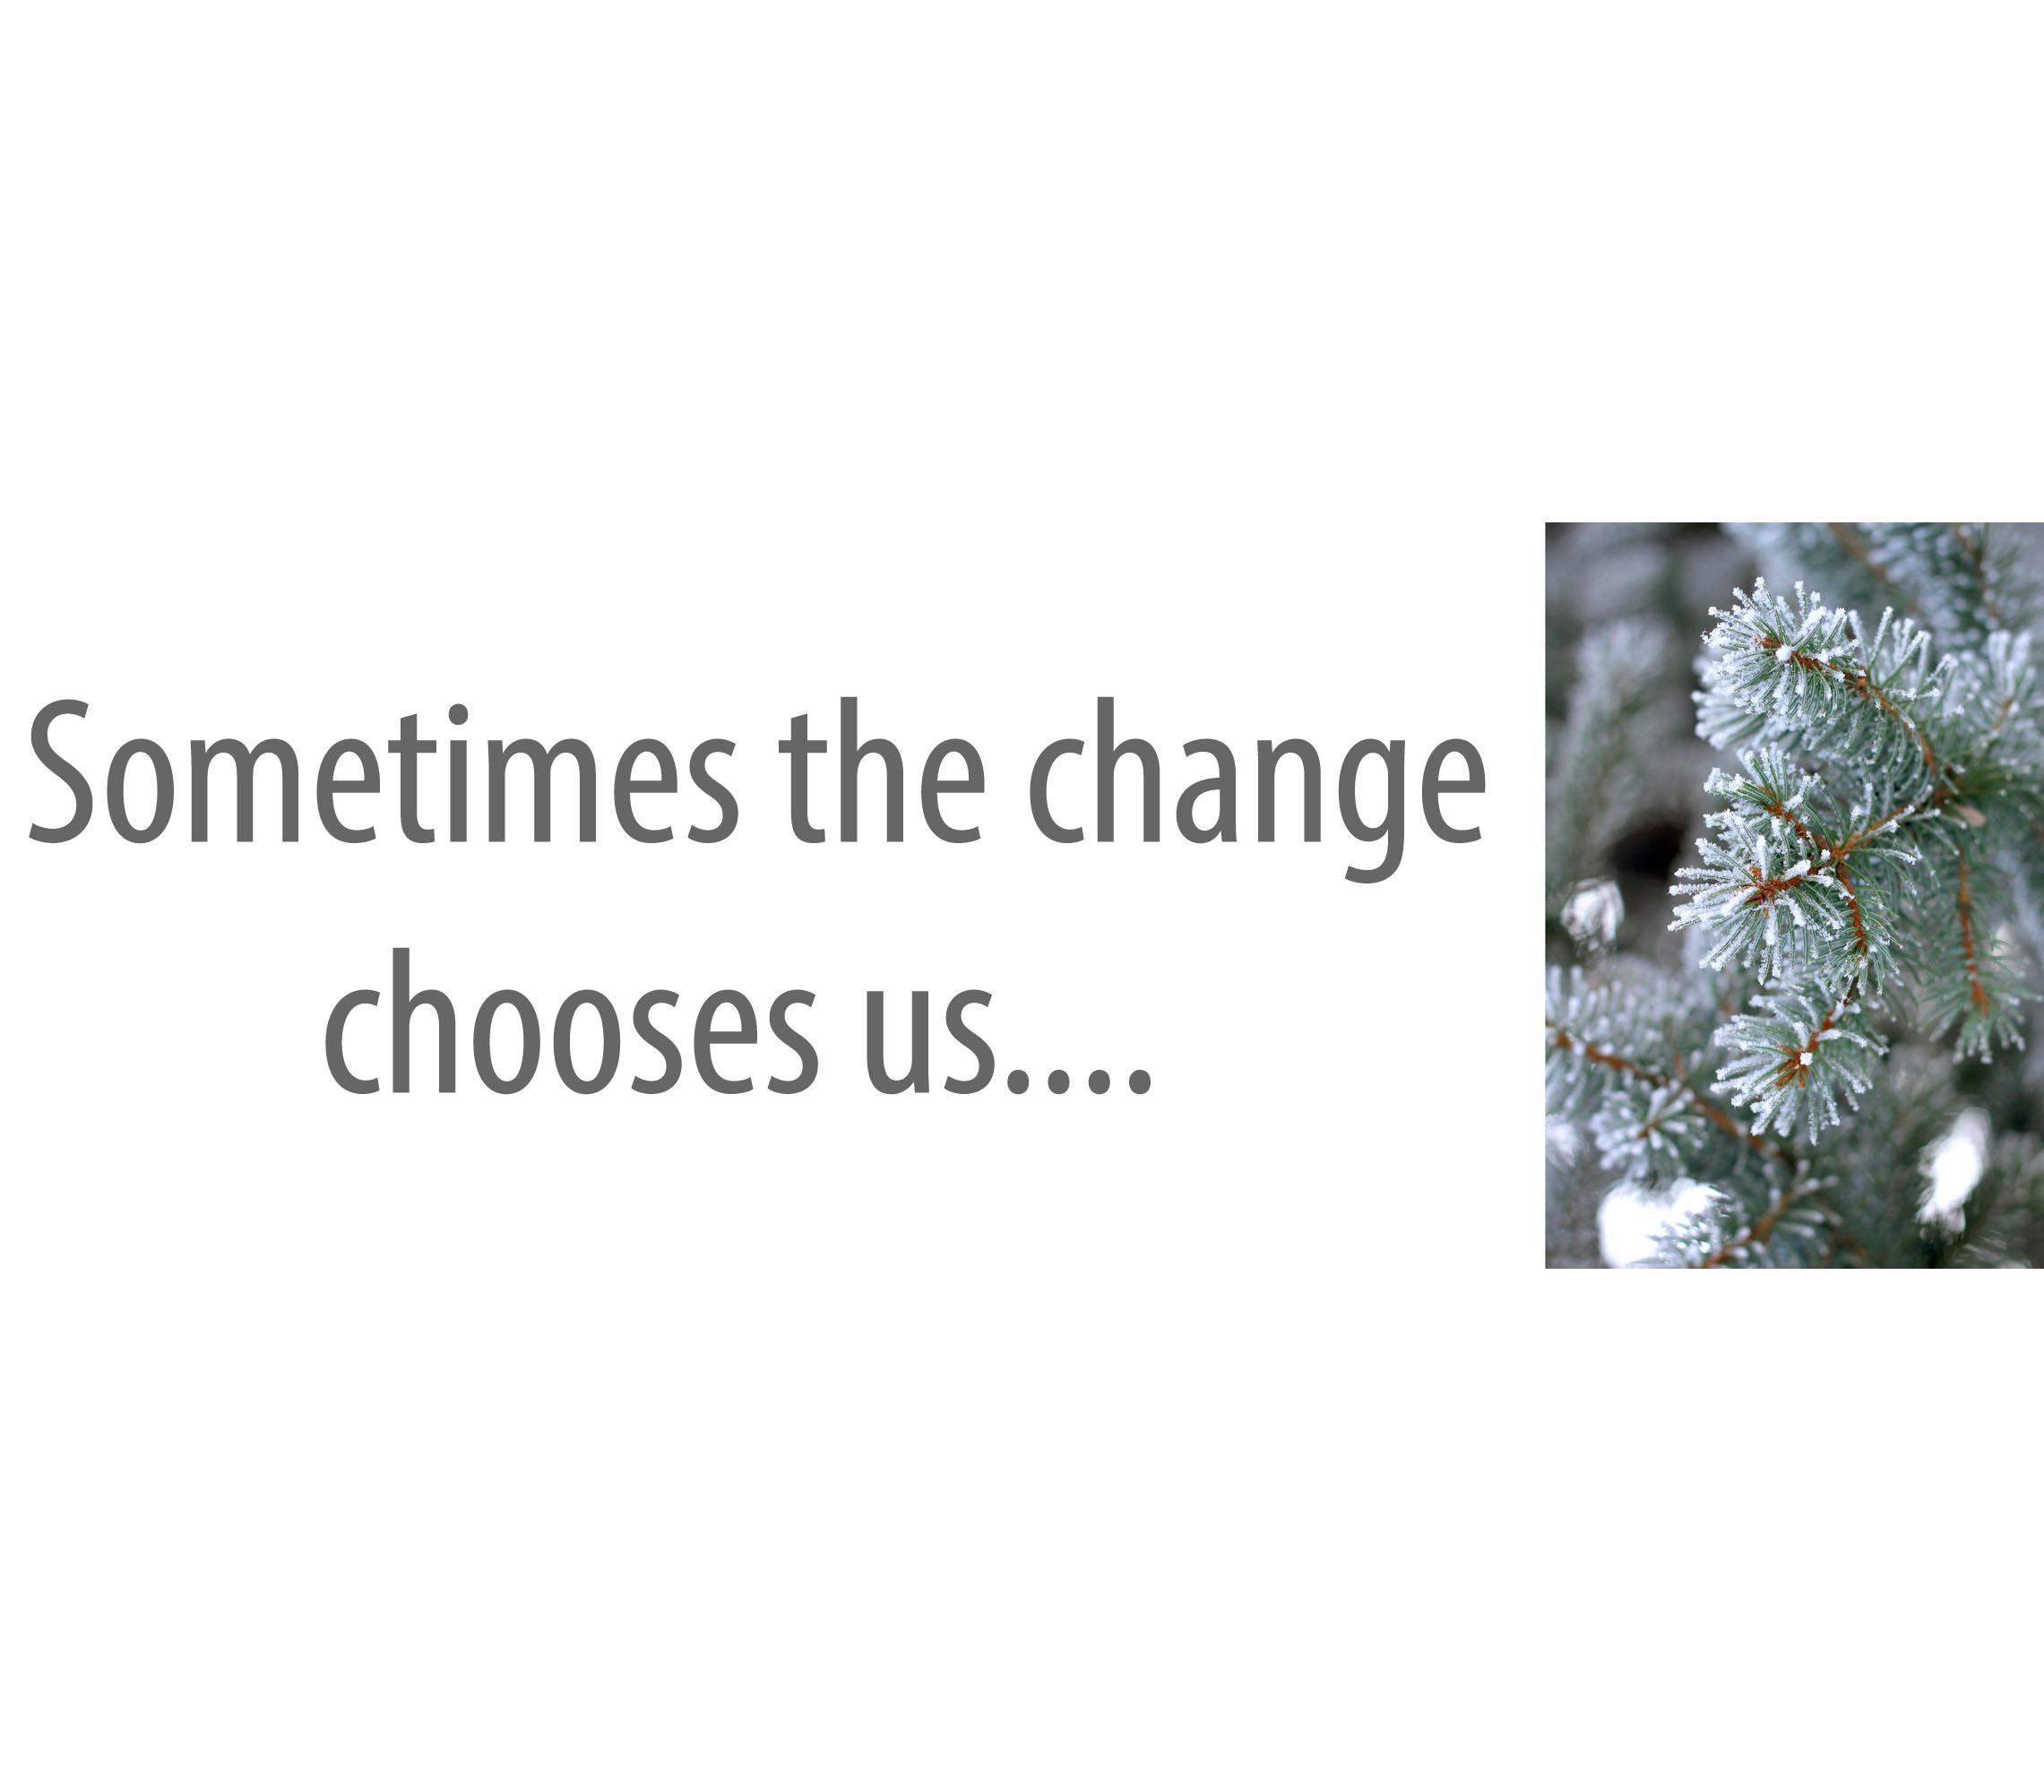 Lynn'sChoice1_0000_Sometimes the change          chooses us.....jpg